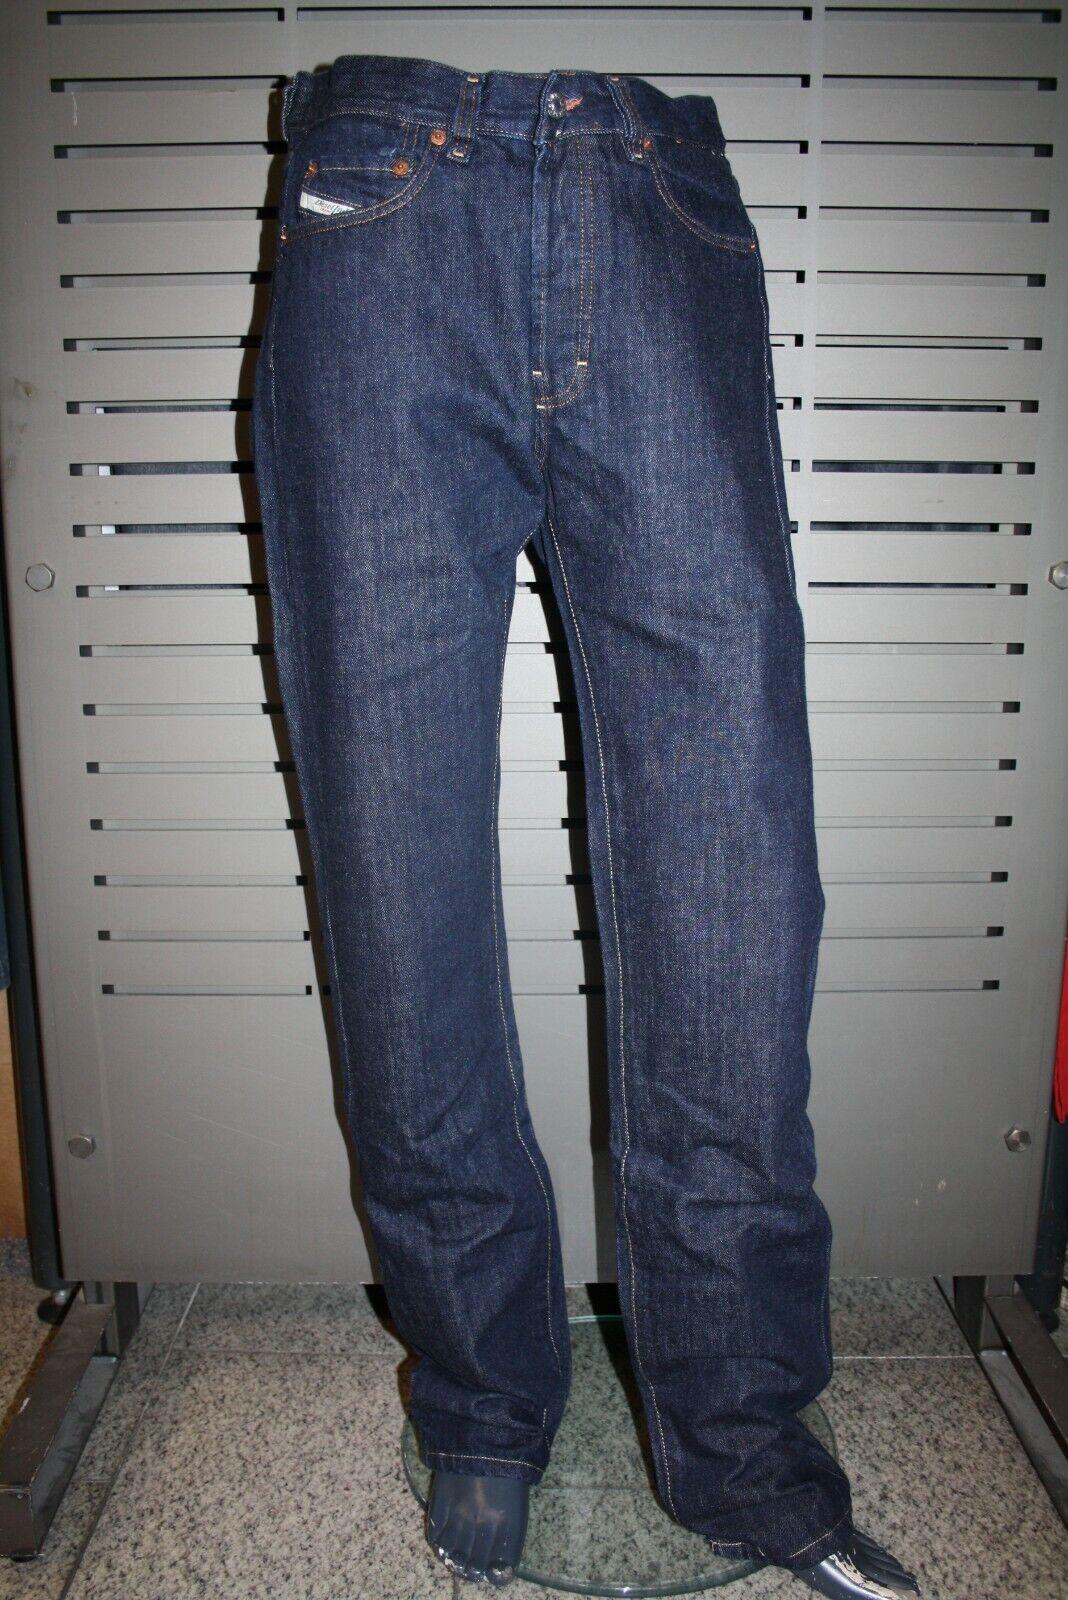 Diesel Jeans Kulter Dark Rinse New Narrow Carred Cut 100% Cotton